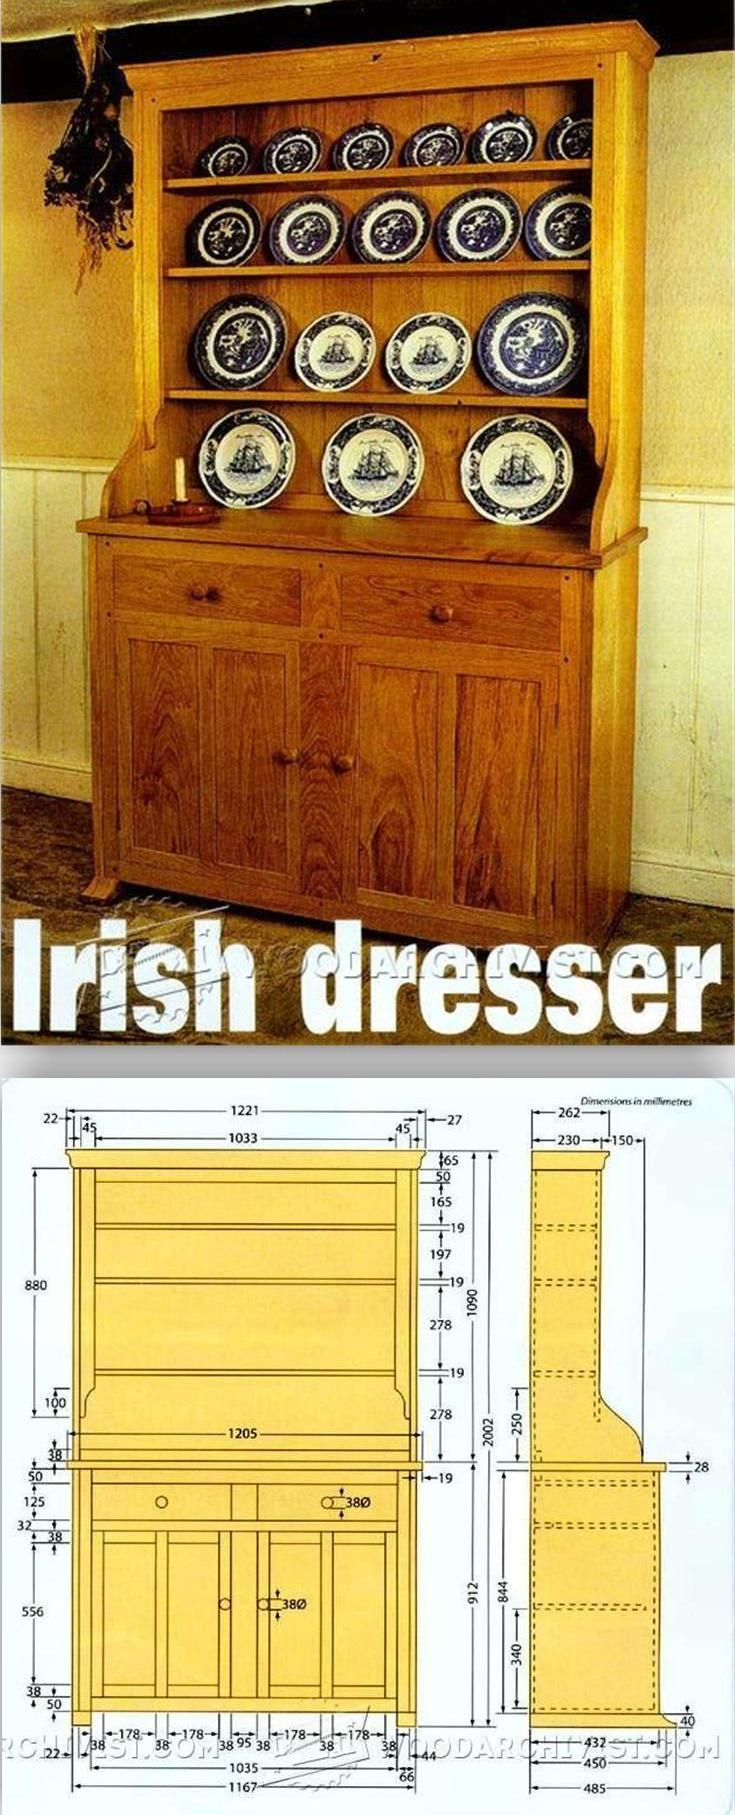 Irish Dresser Plans - Furniture Plans and Projects | WoodArchivist.com